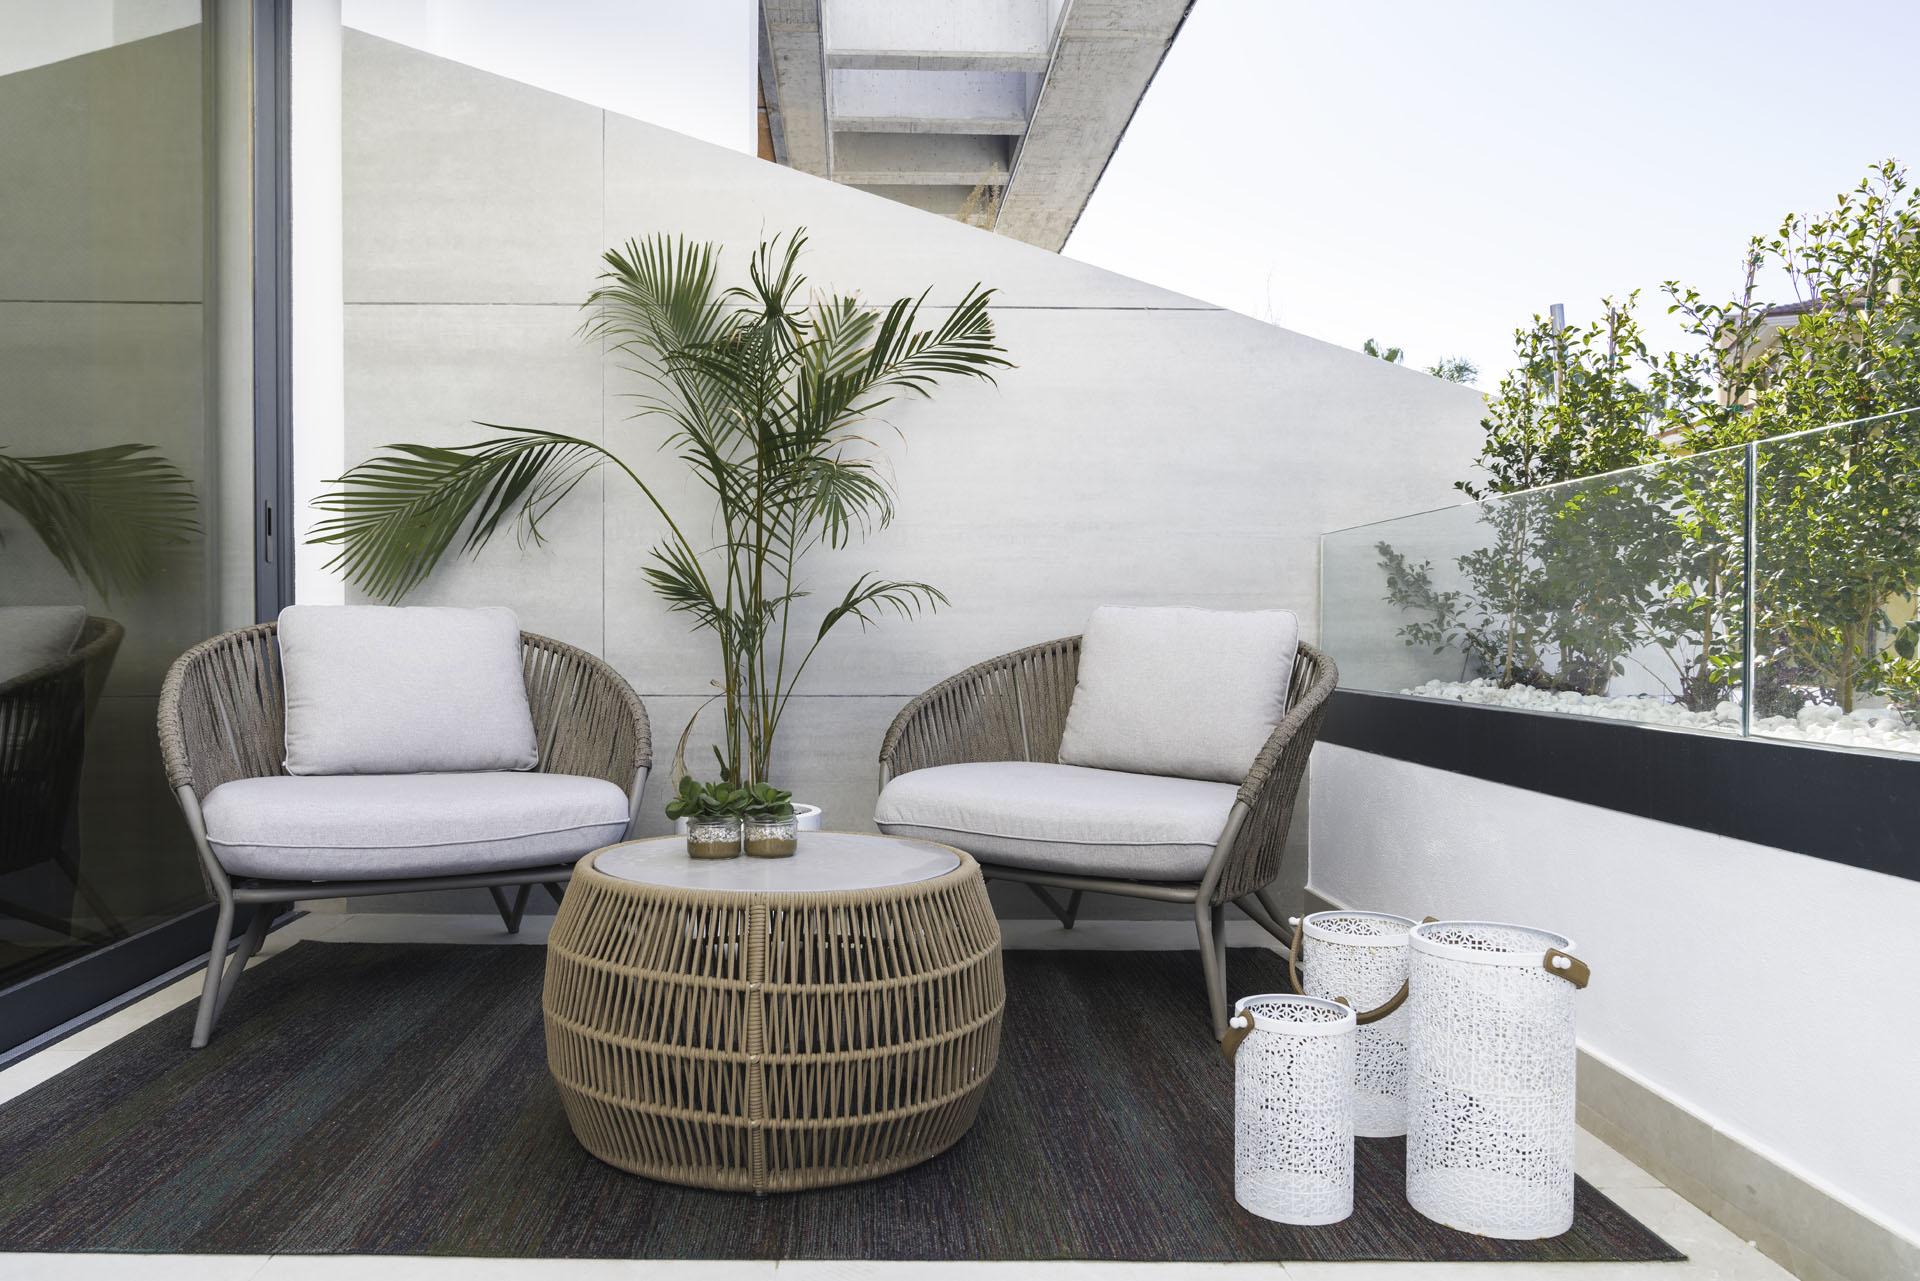 decoracion villa piloto dormitorio terraza